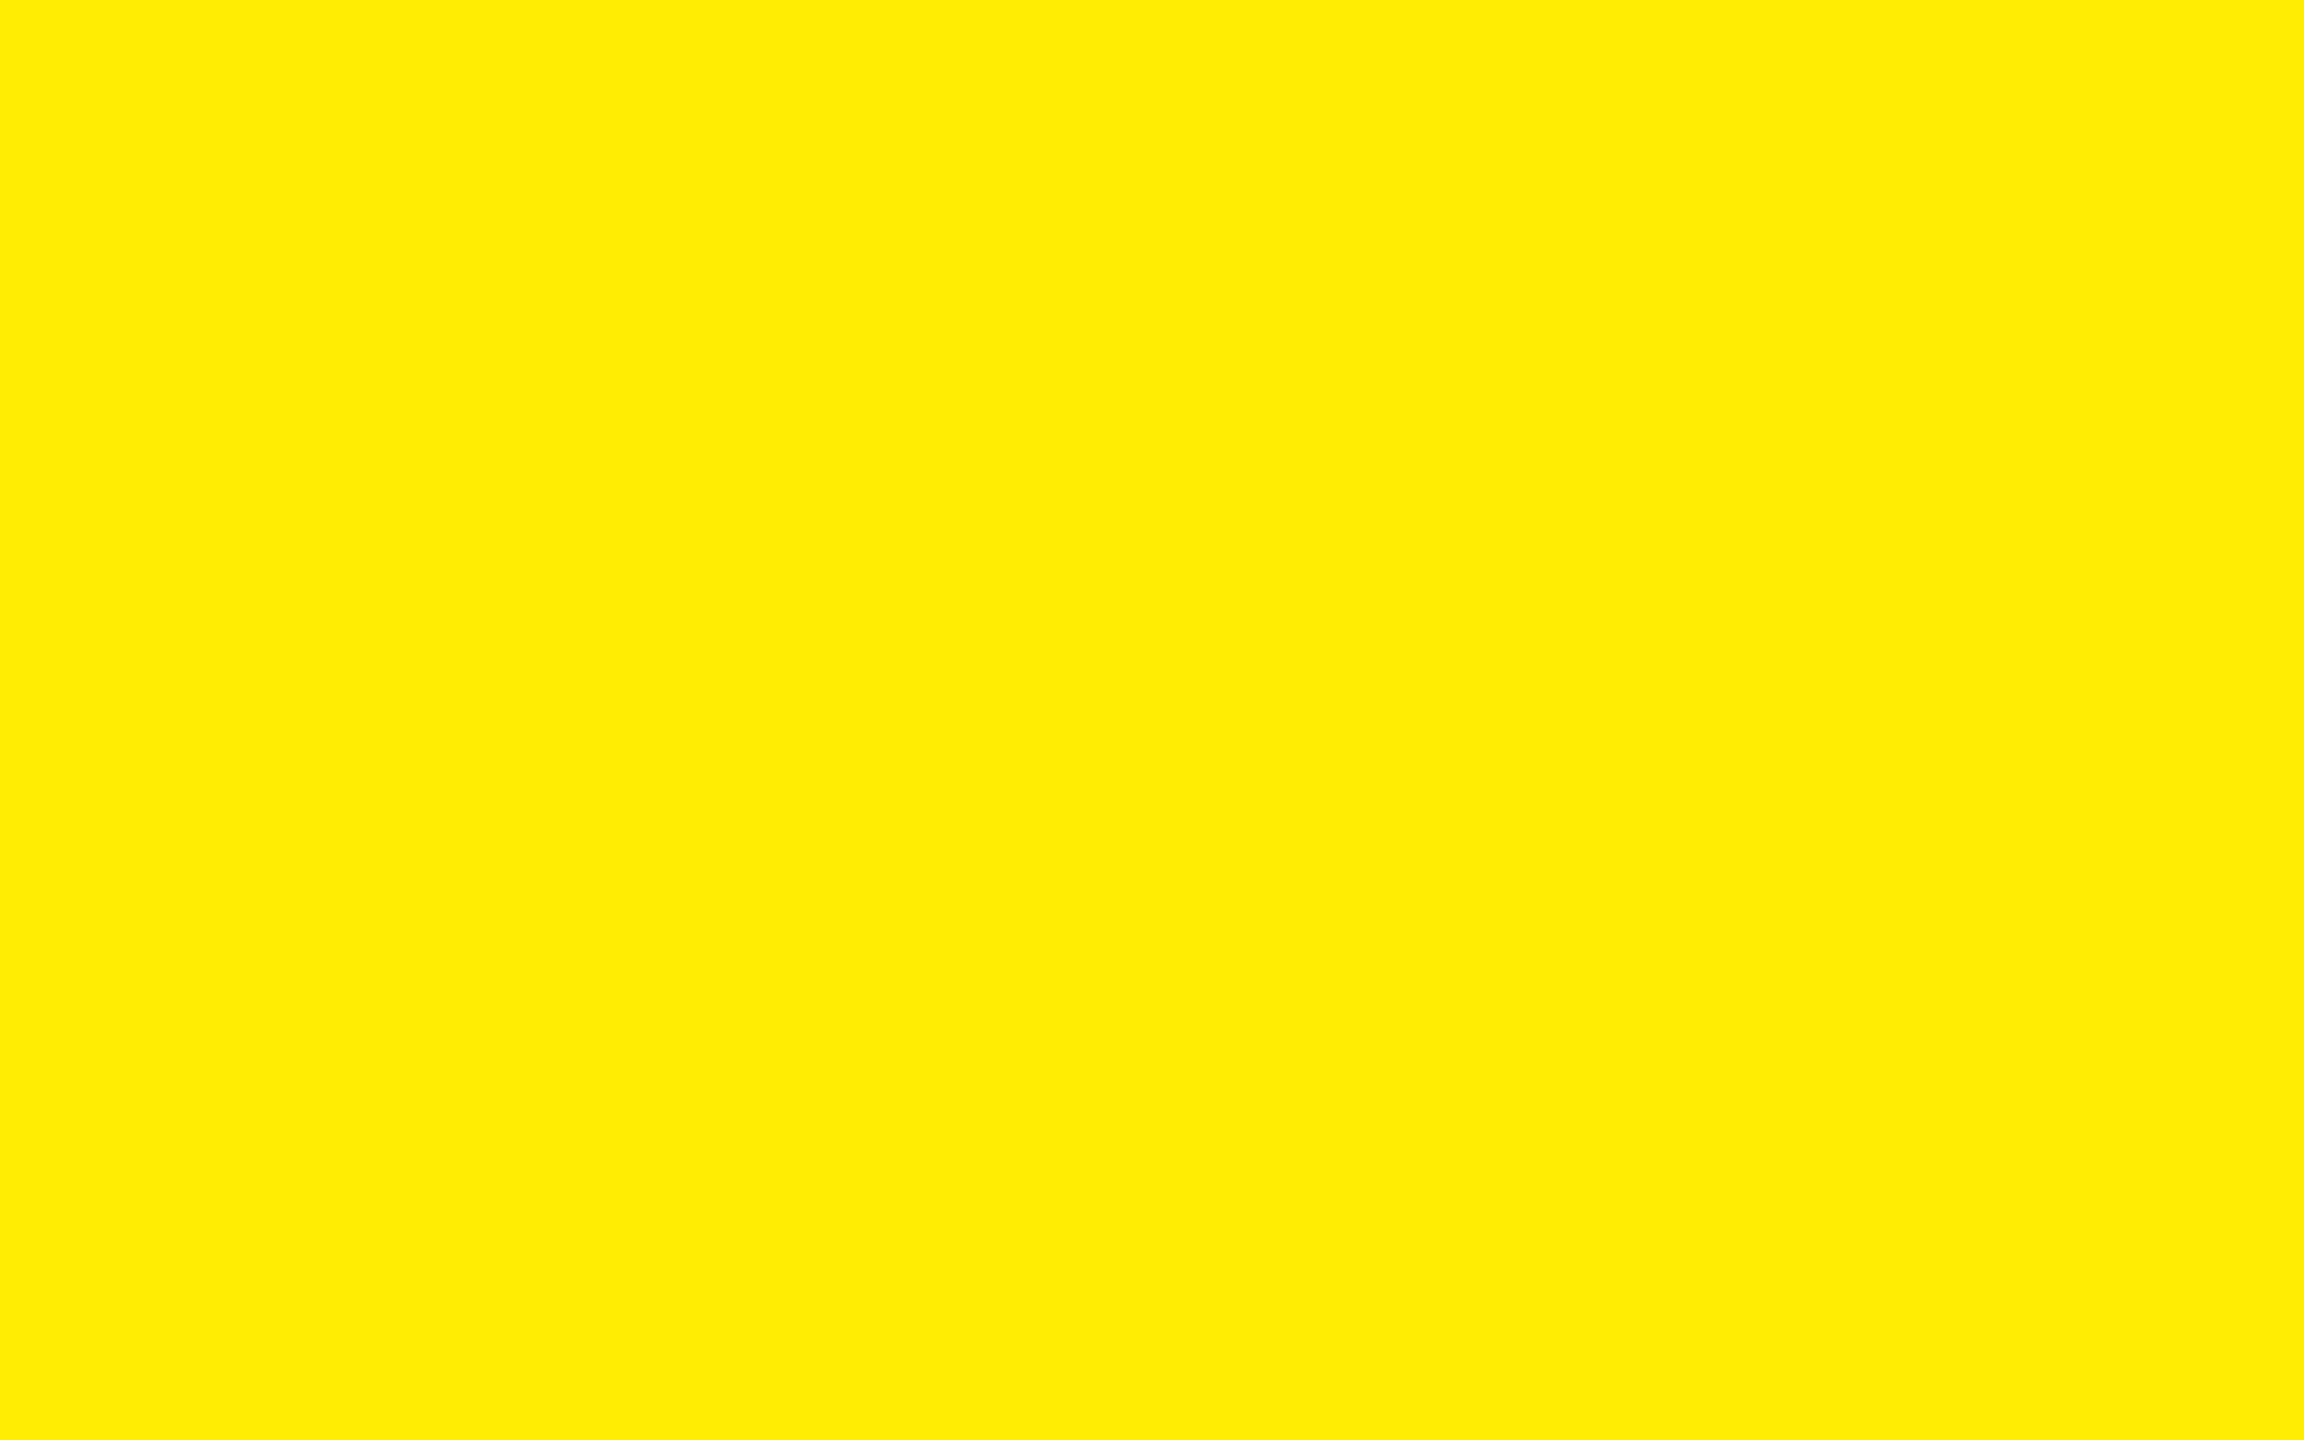 2304x1440 Aureolin Solid Color Background